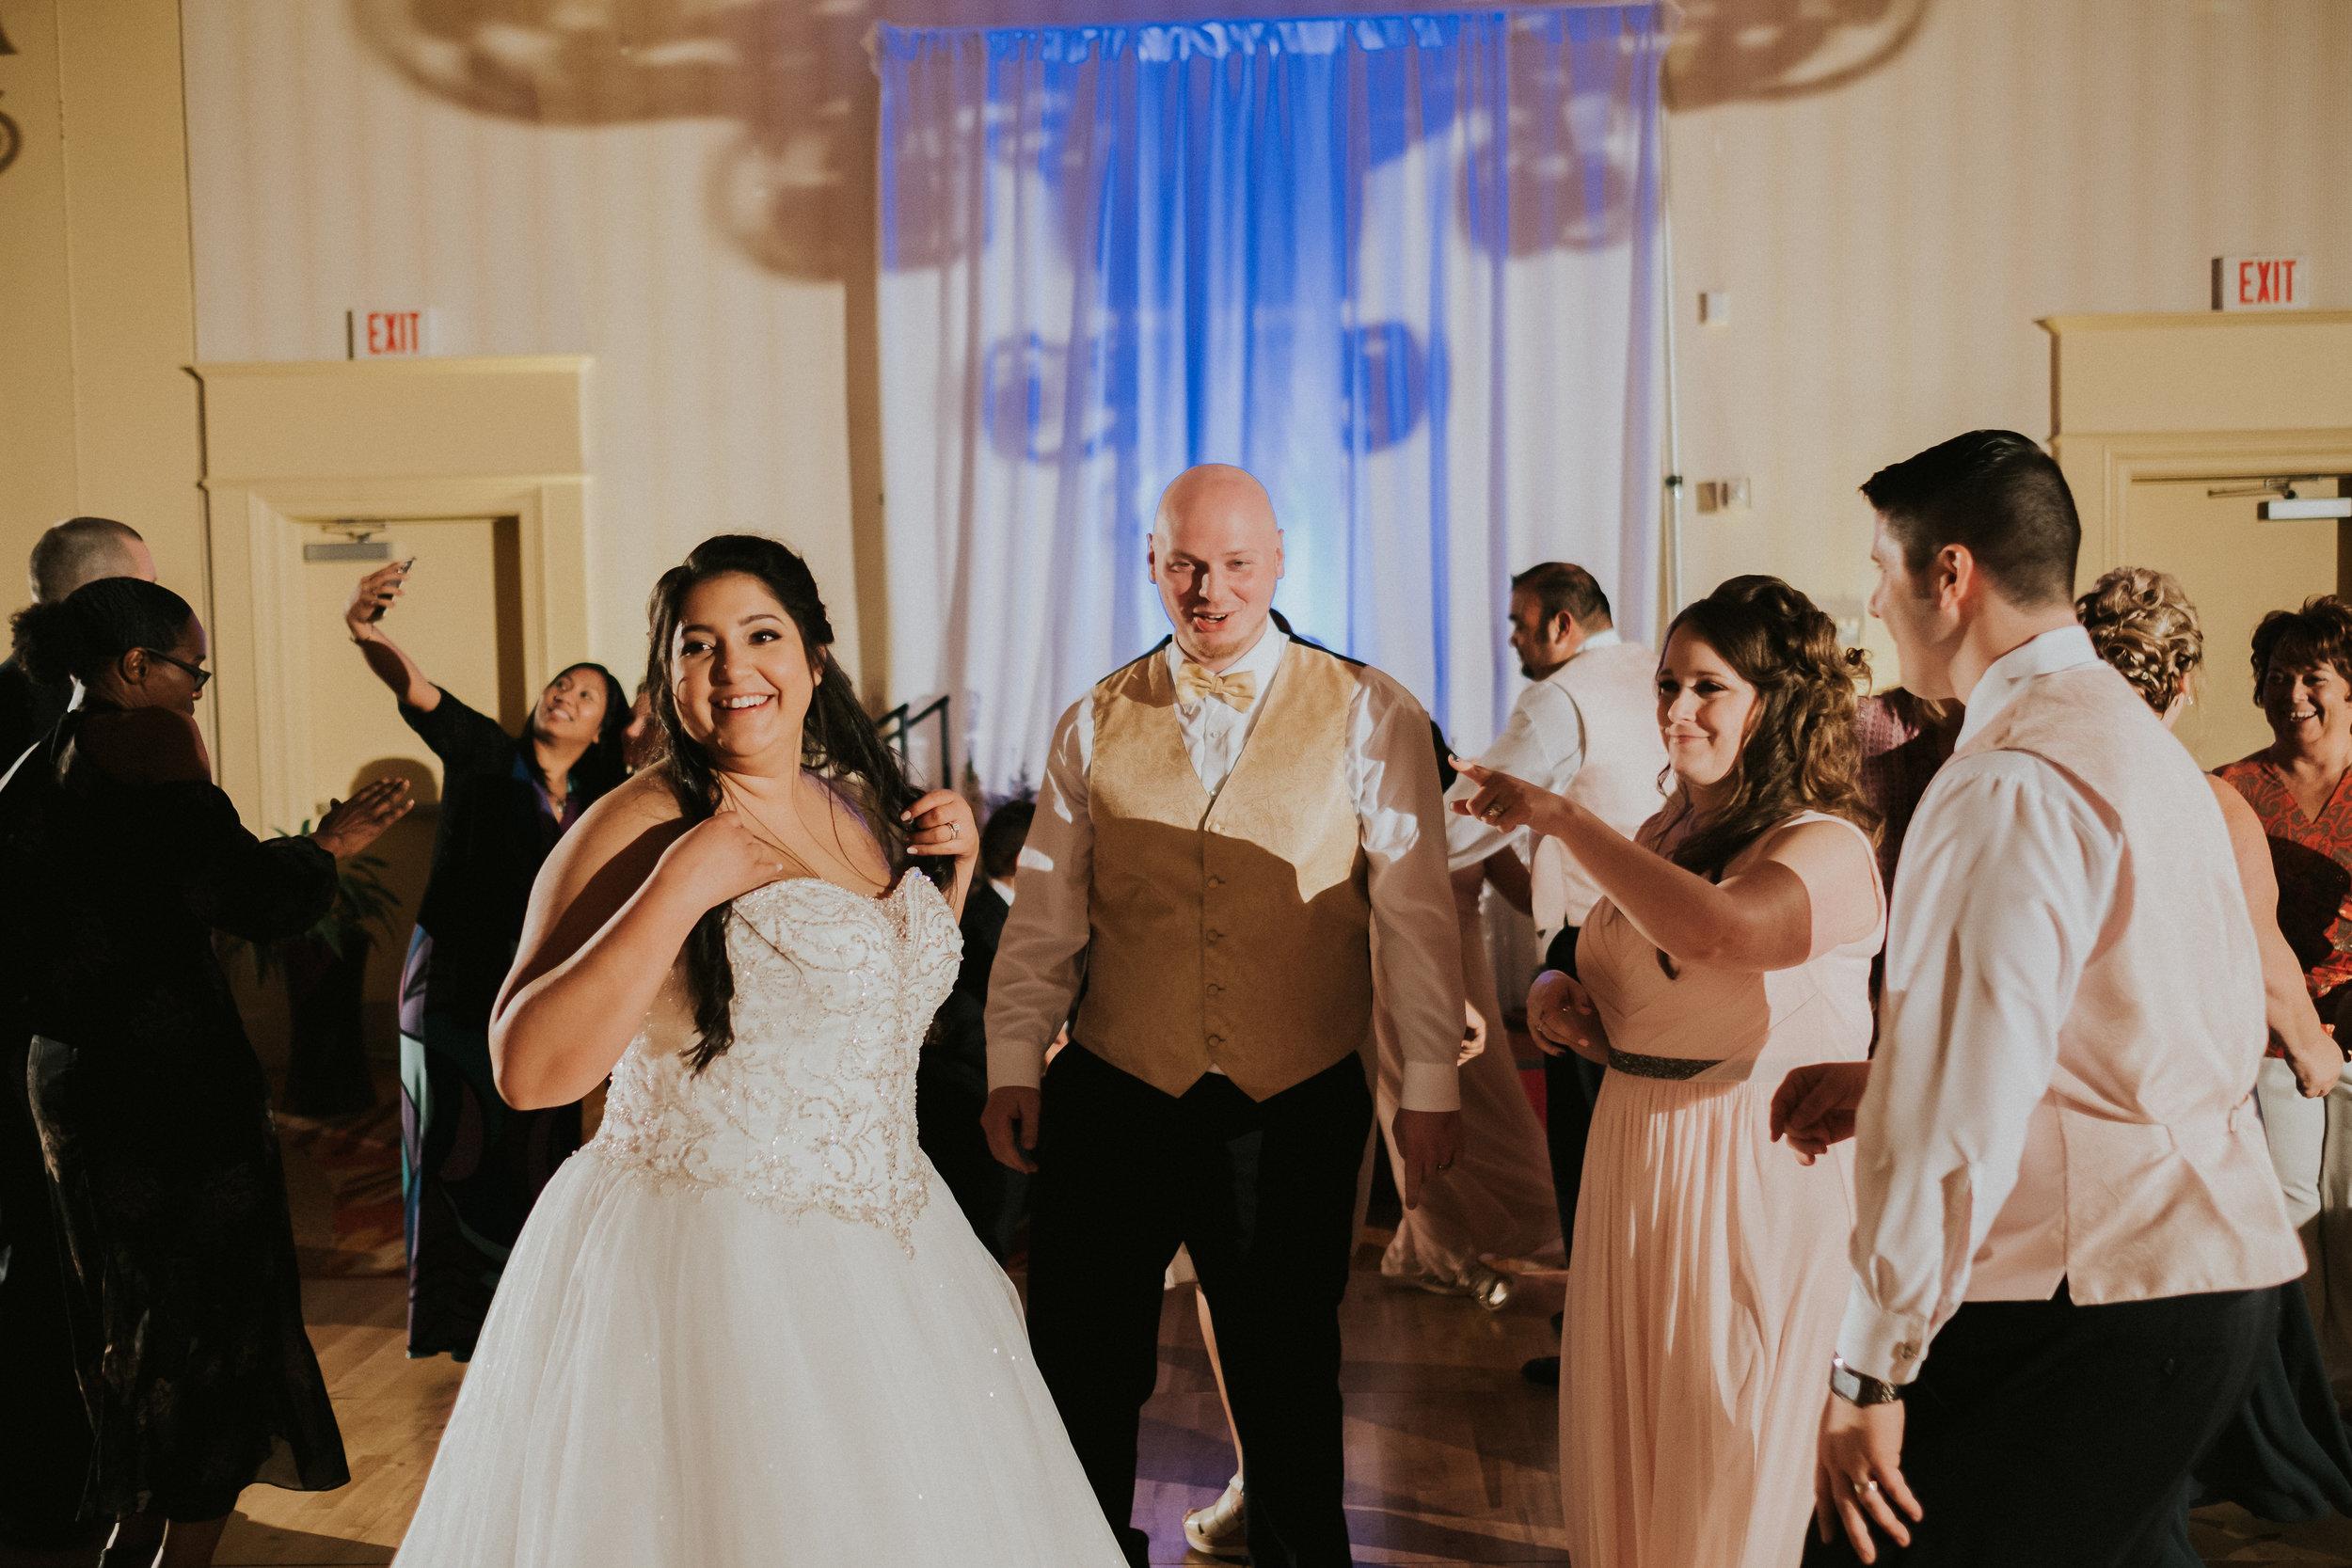 Barclay-Farmstead-Wedding-Rosa-and-Mike-616.jpg